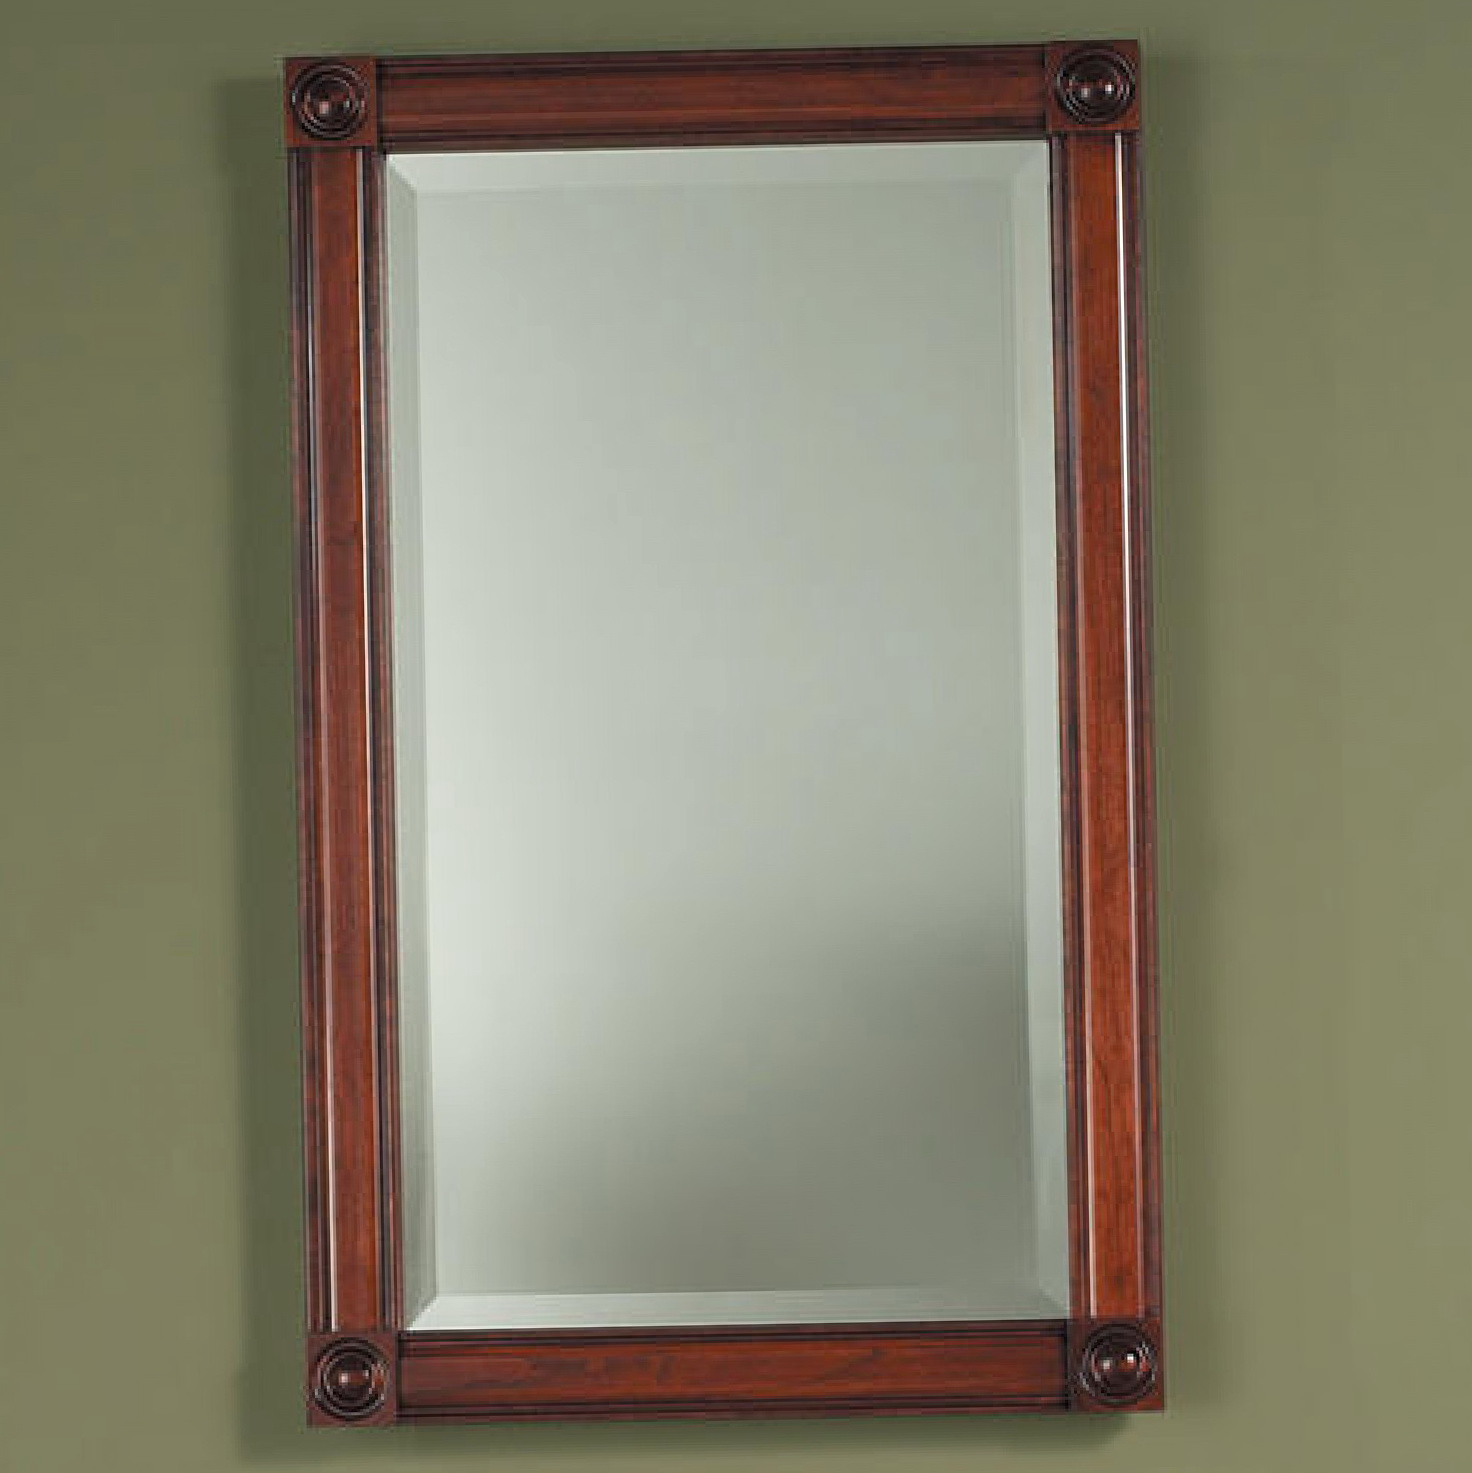 Recessed Mirrored Medicine Cabinet